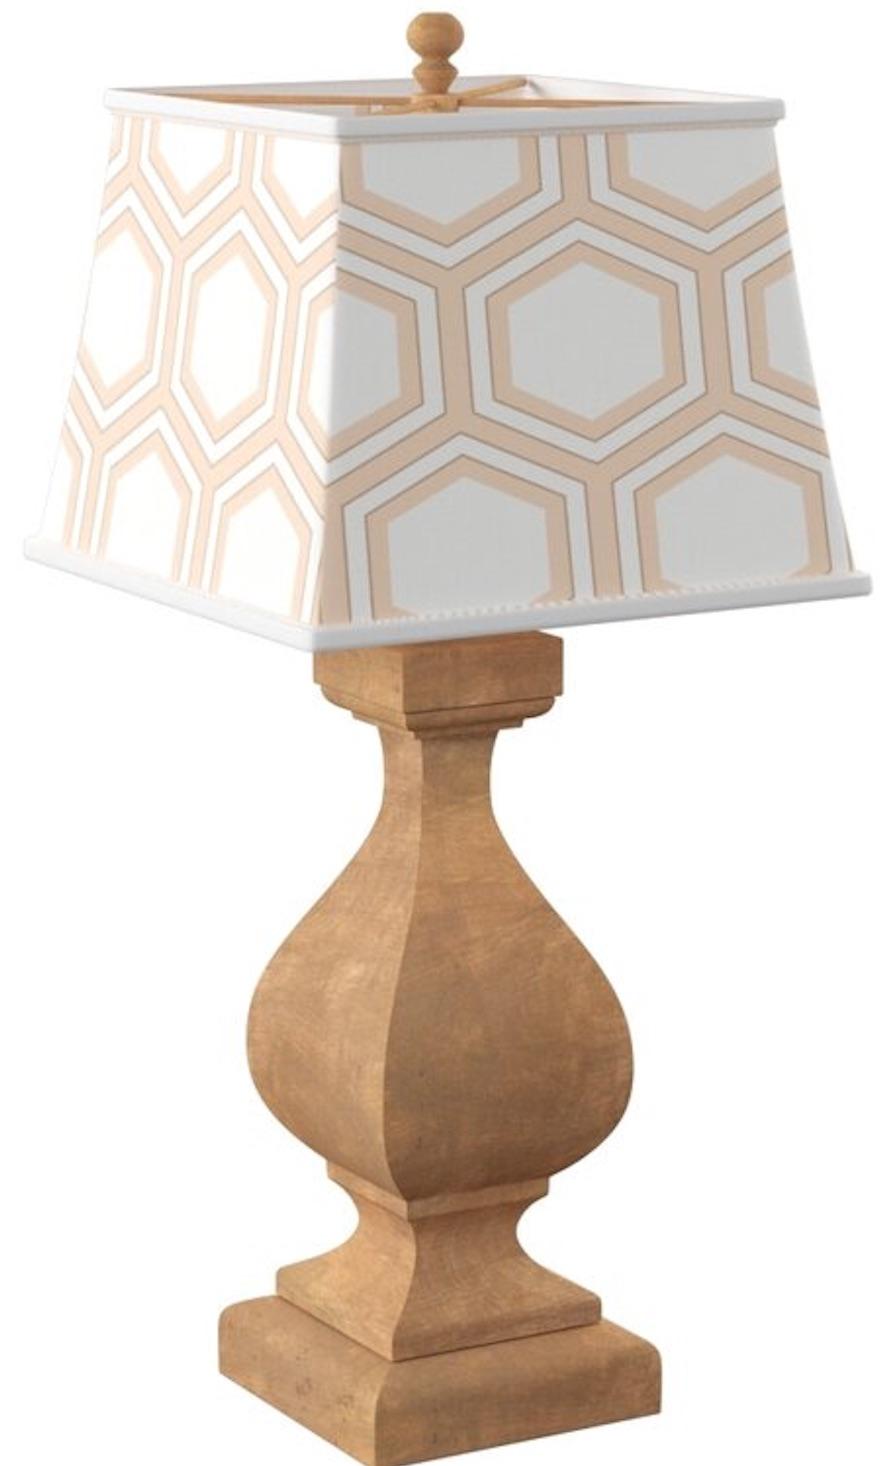 33 Simple Farmhouse Table Lamps Frances Table Lamp #Farmhouse #FarmhouseTableLamps #FarmhouseLighting #RusticDecor #CountryDecor #FarmhouseDecor